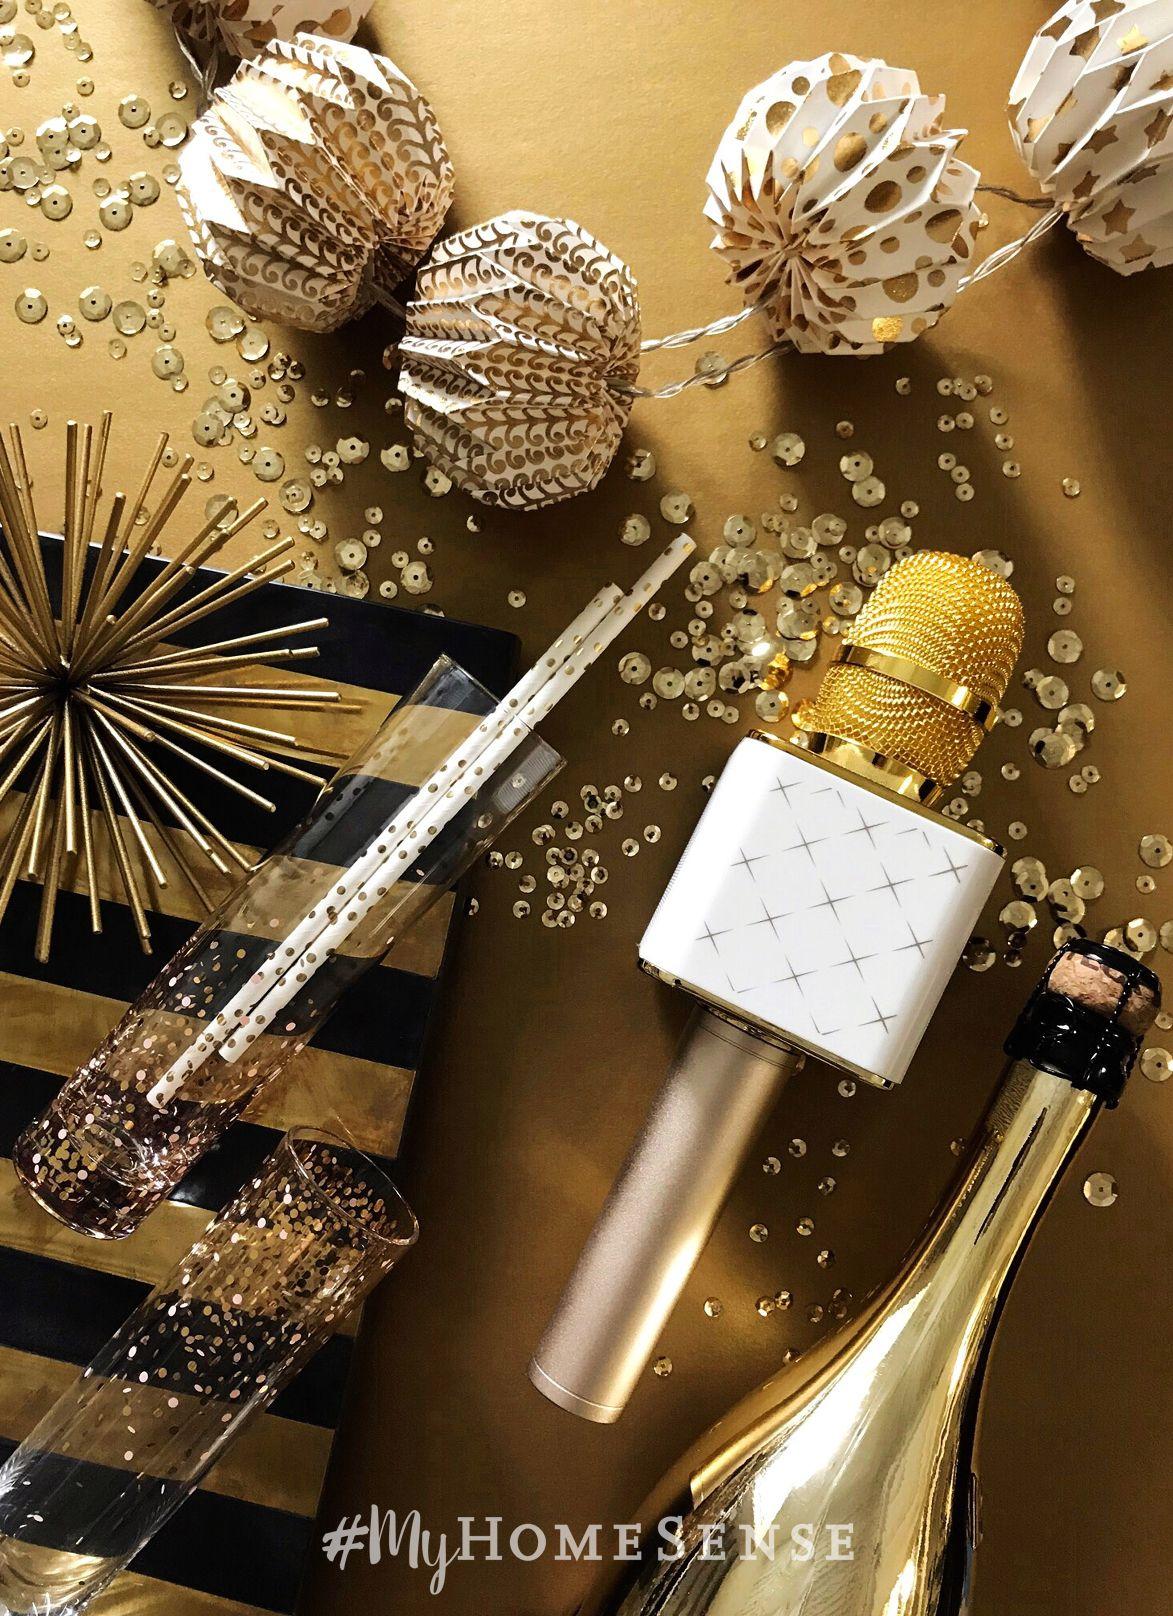 Store Locator Homesense, Fancy drinks, New years eve dinner